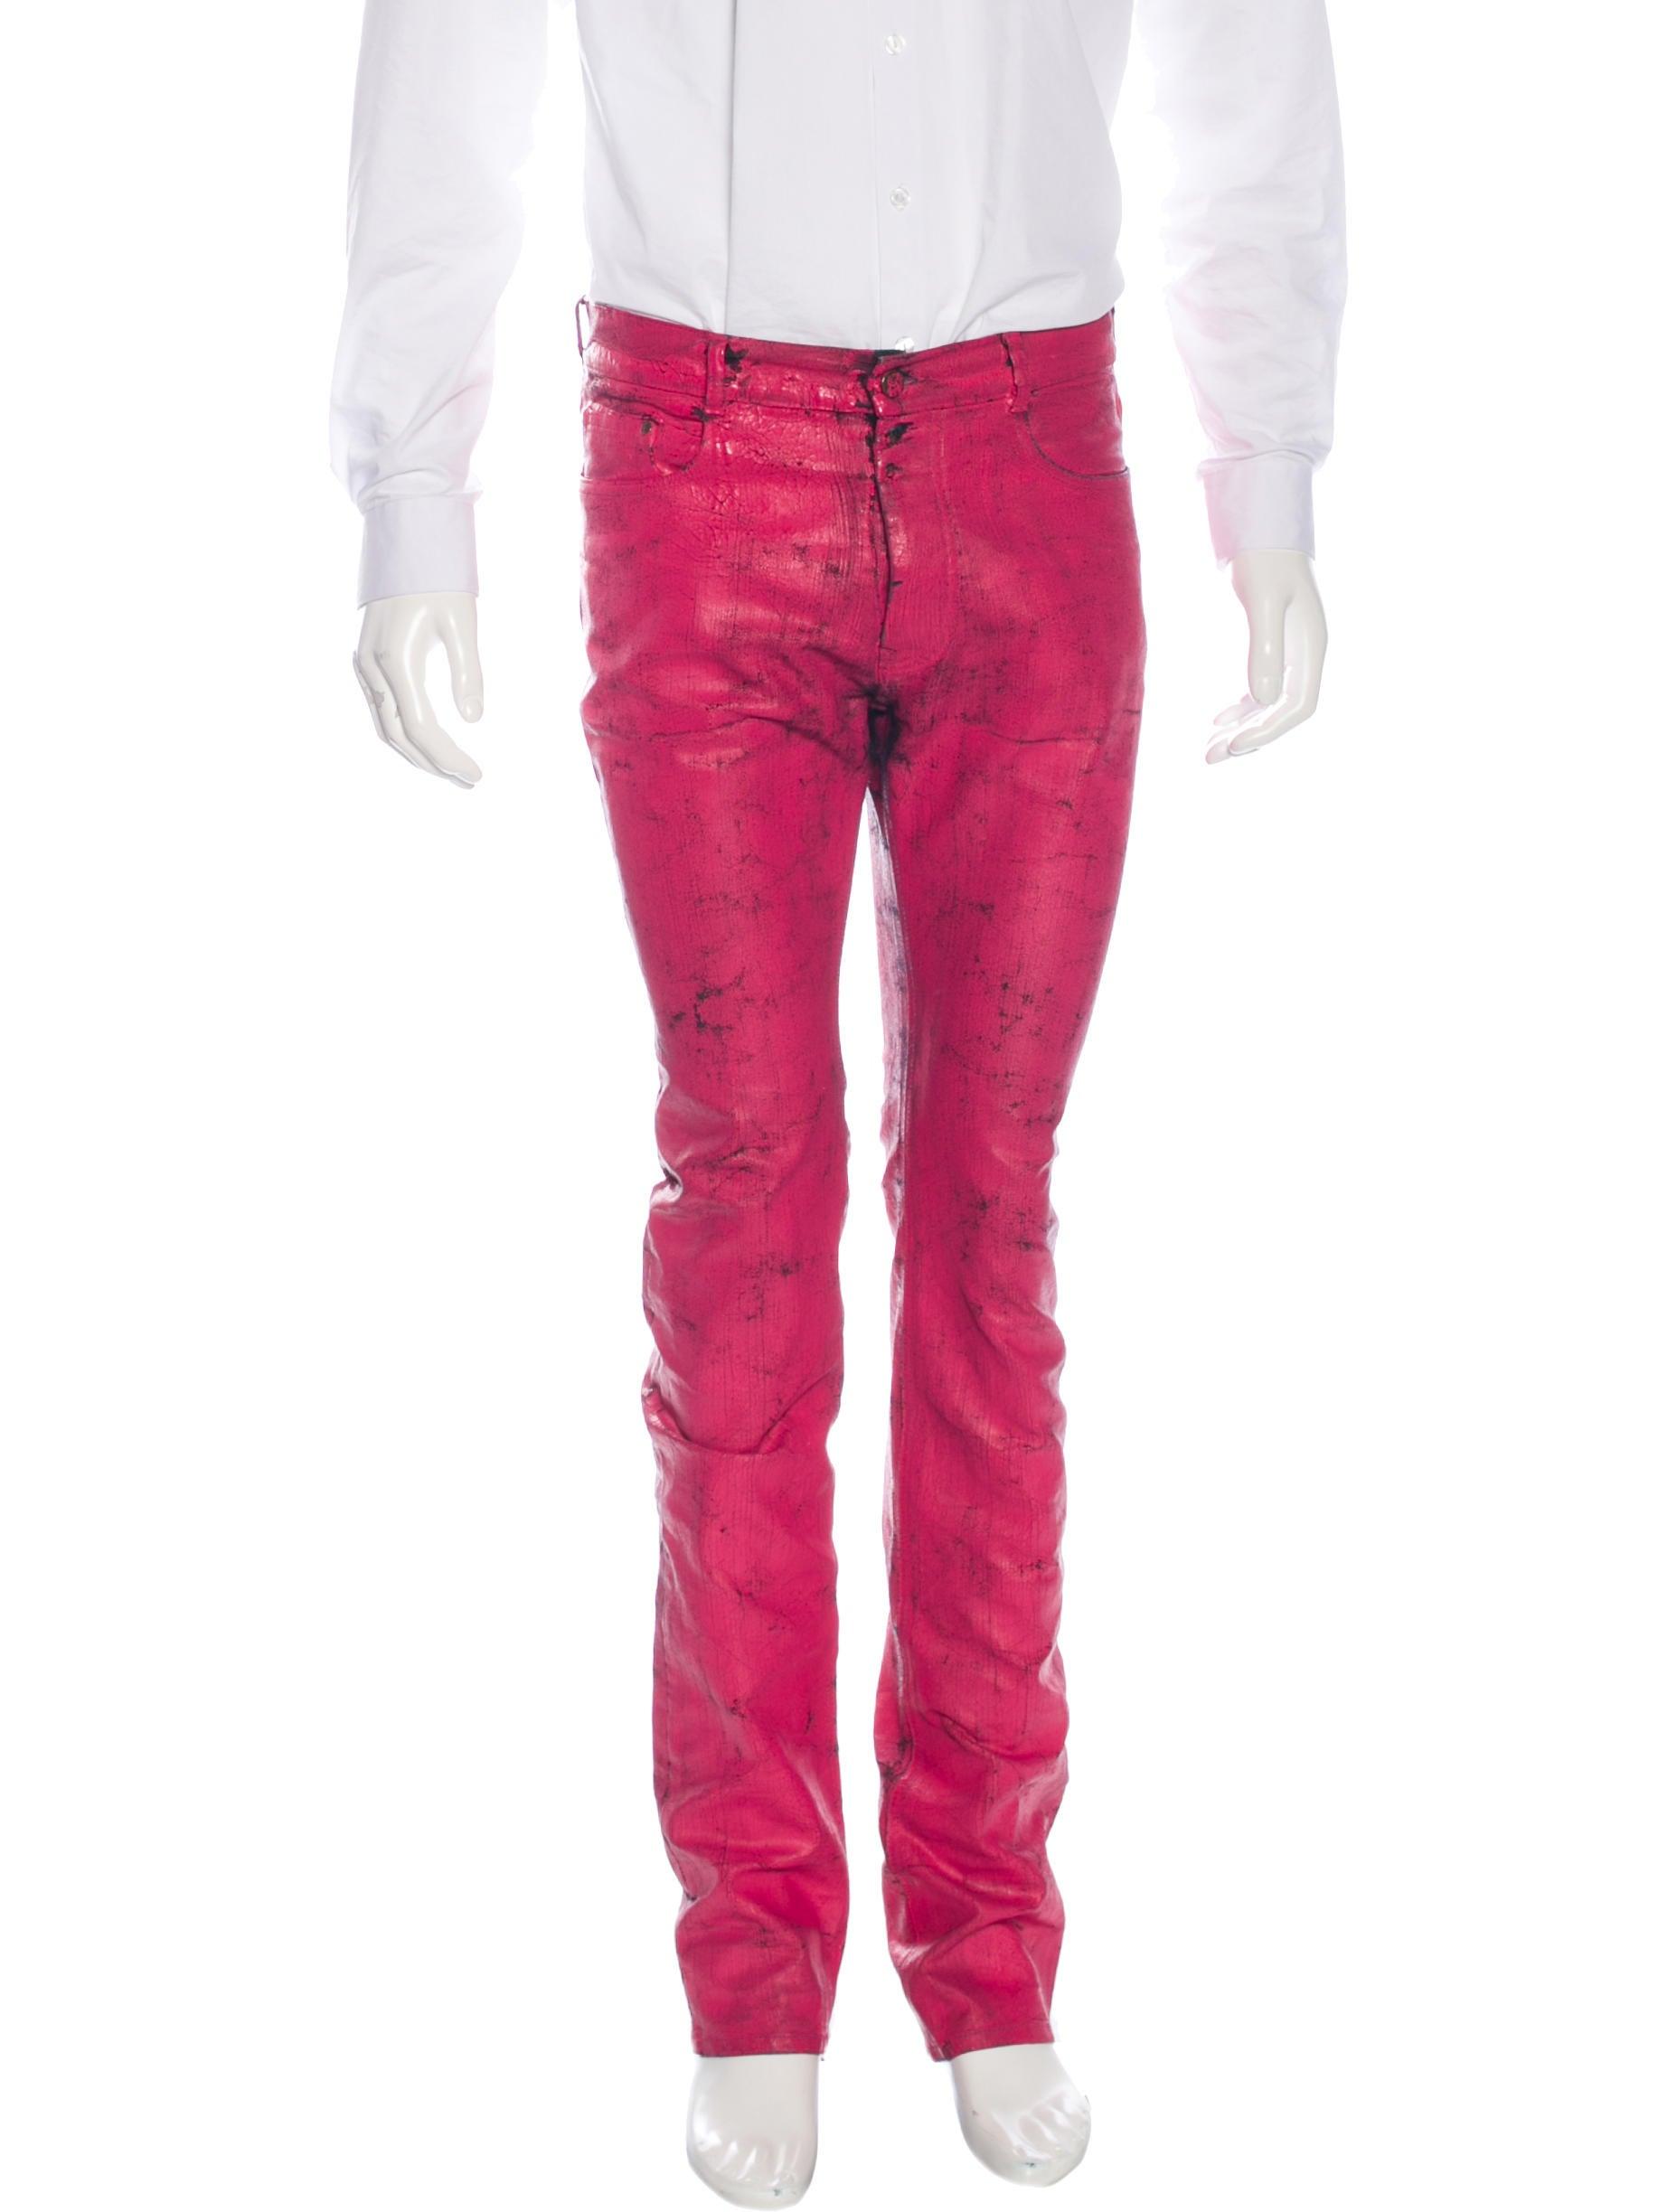 Maison margiela distressed painted jeans clothing for 10 moulmein rise la maison